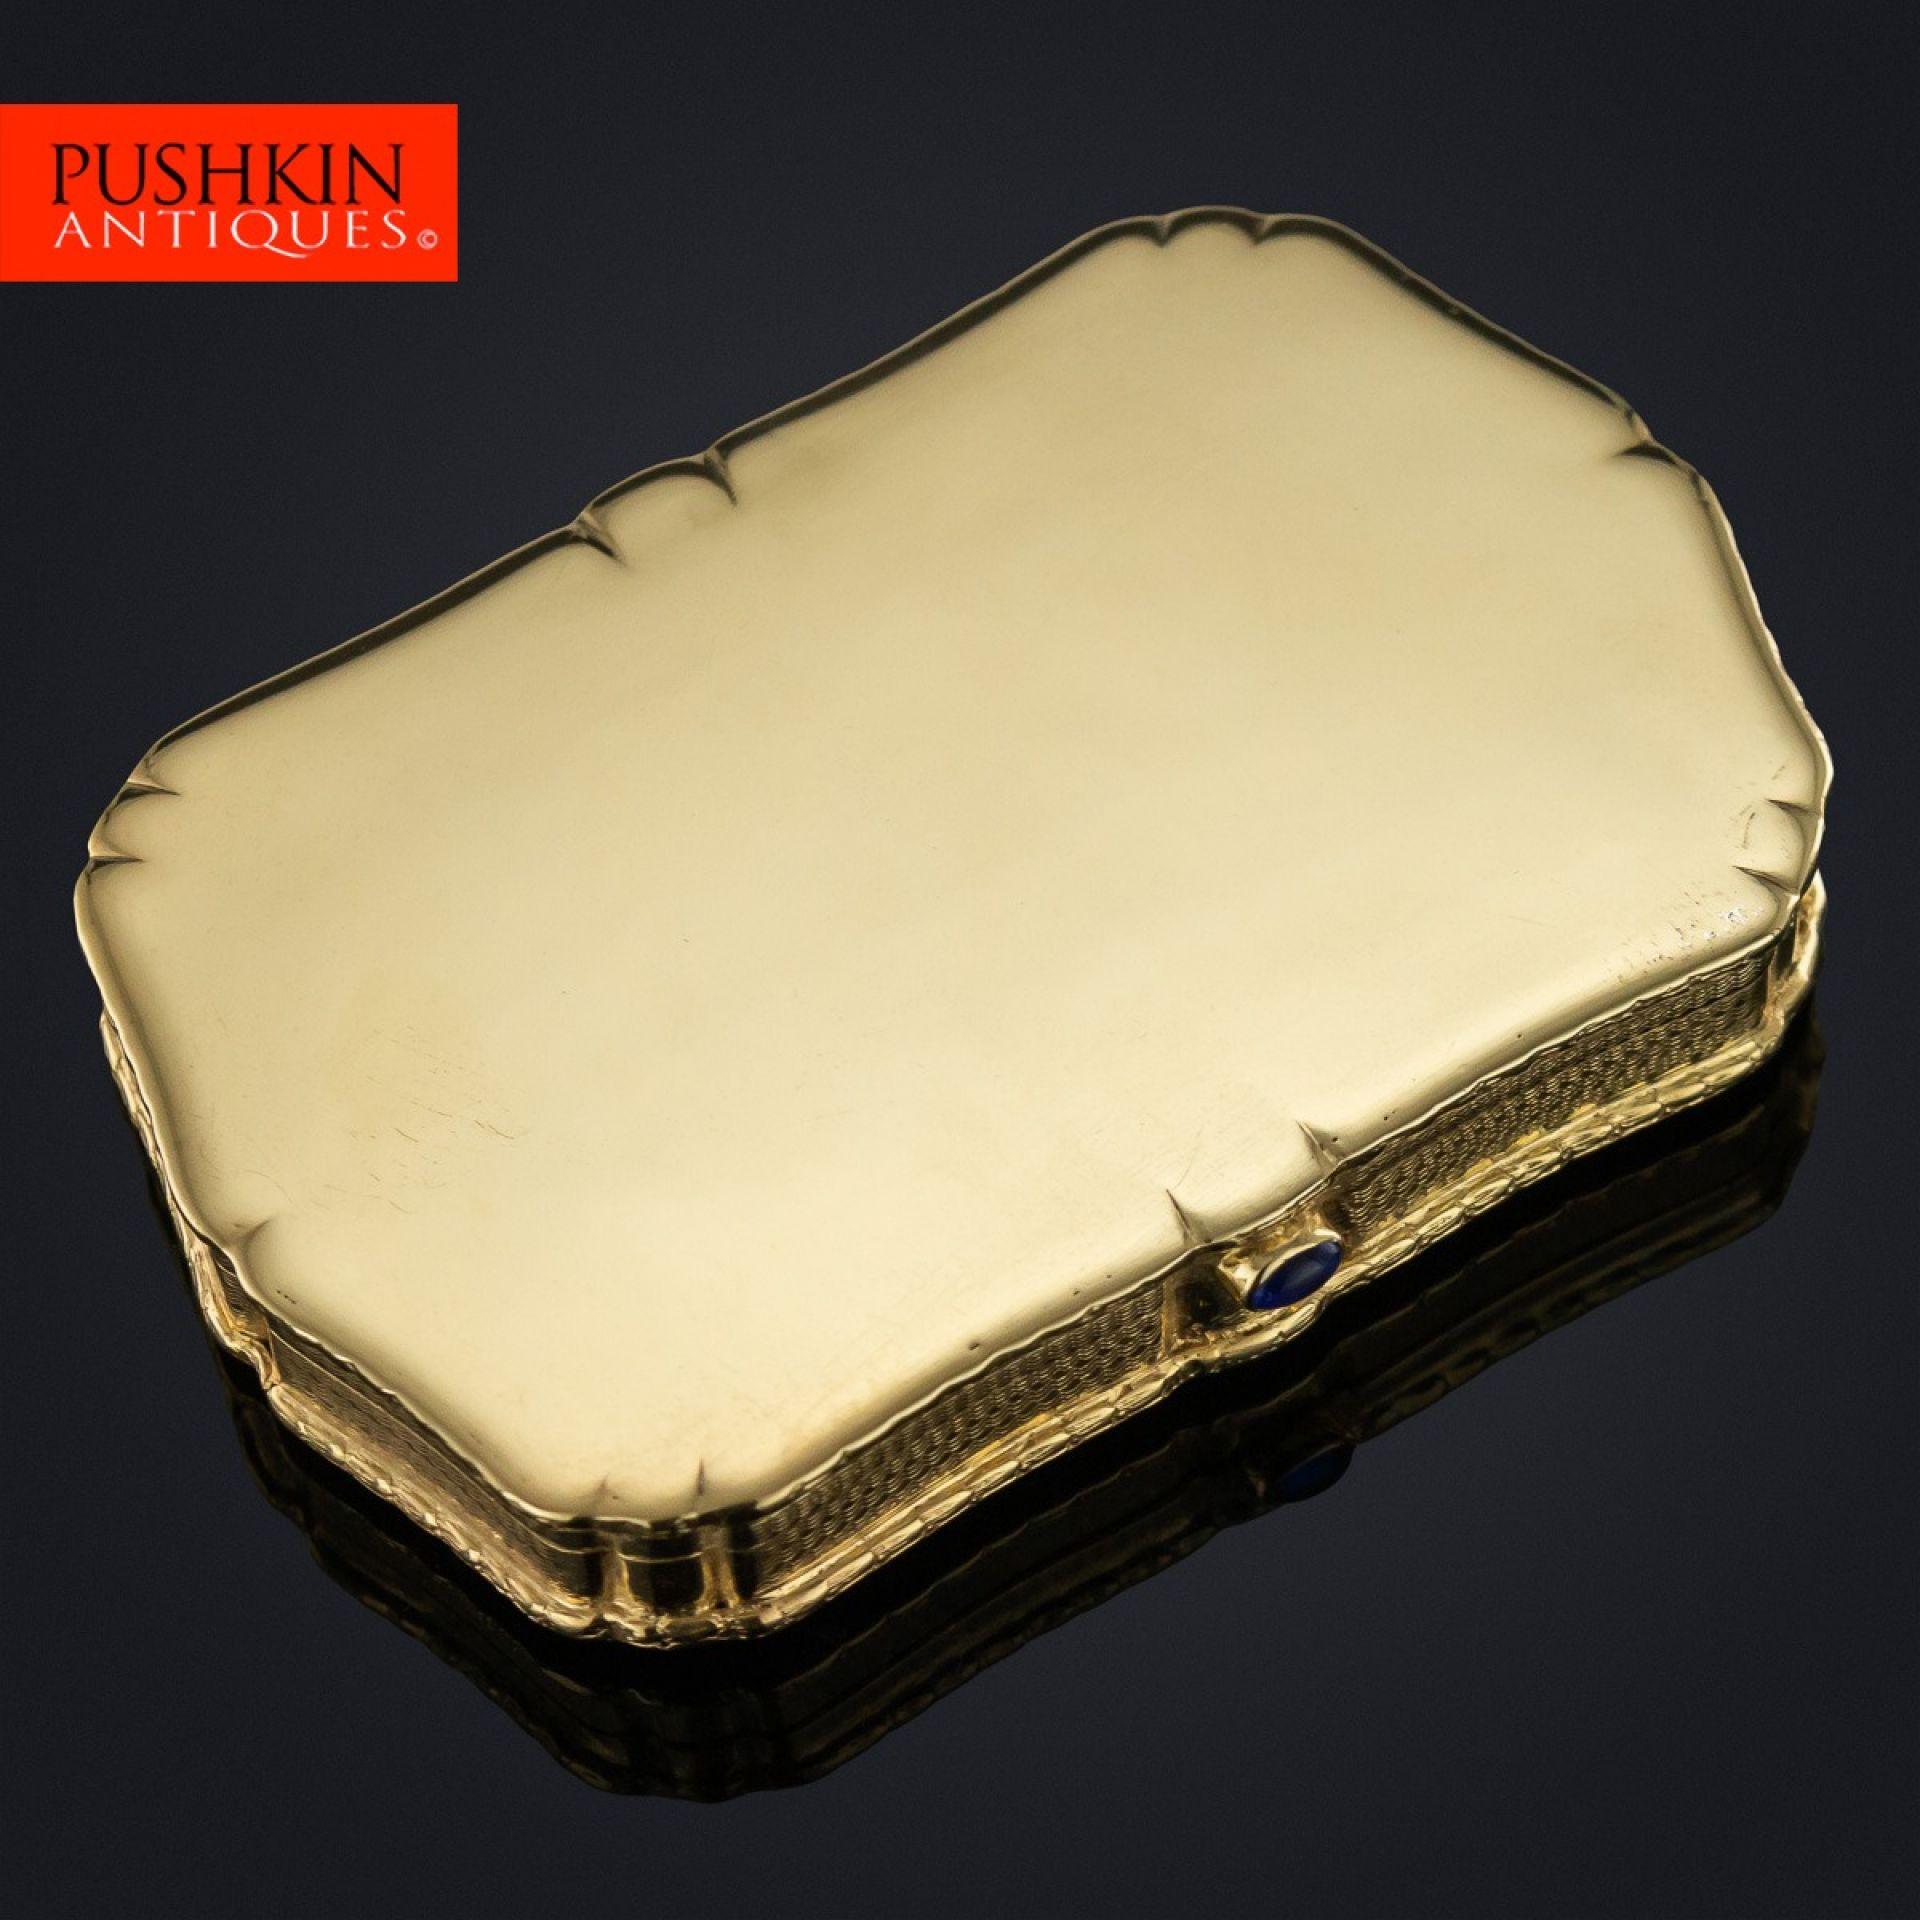 ELEGANT 20thC ITALIAN 18k GOLD & SAPPHIRE VANITY BOX c.1940